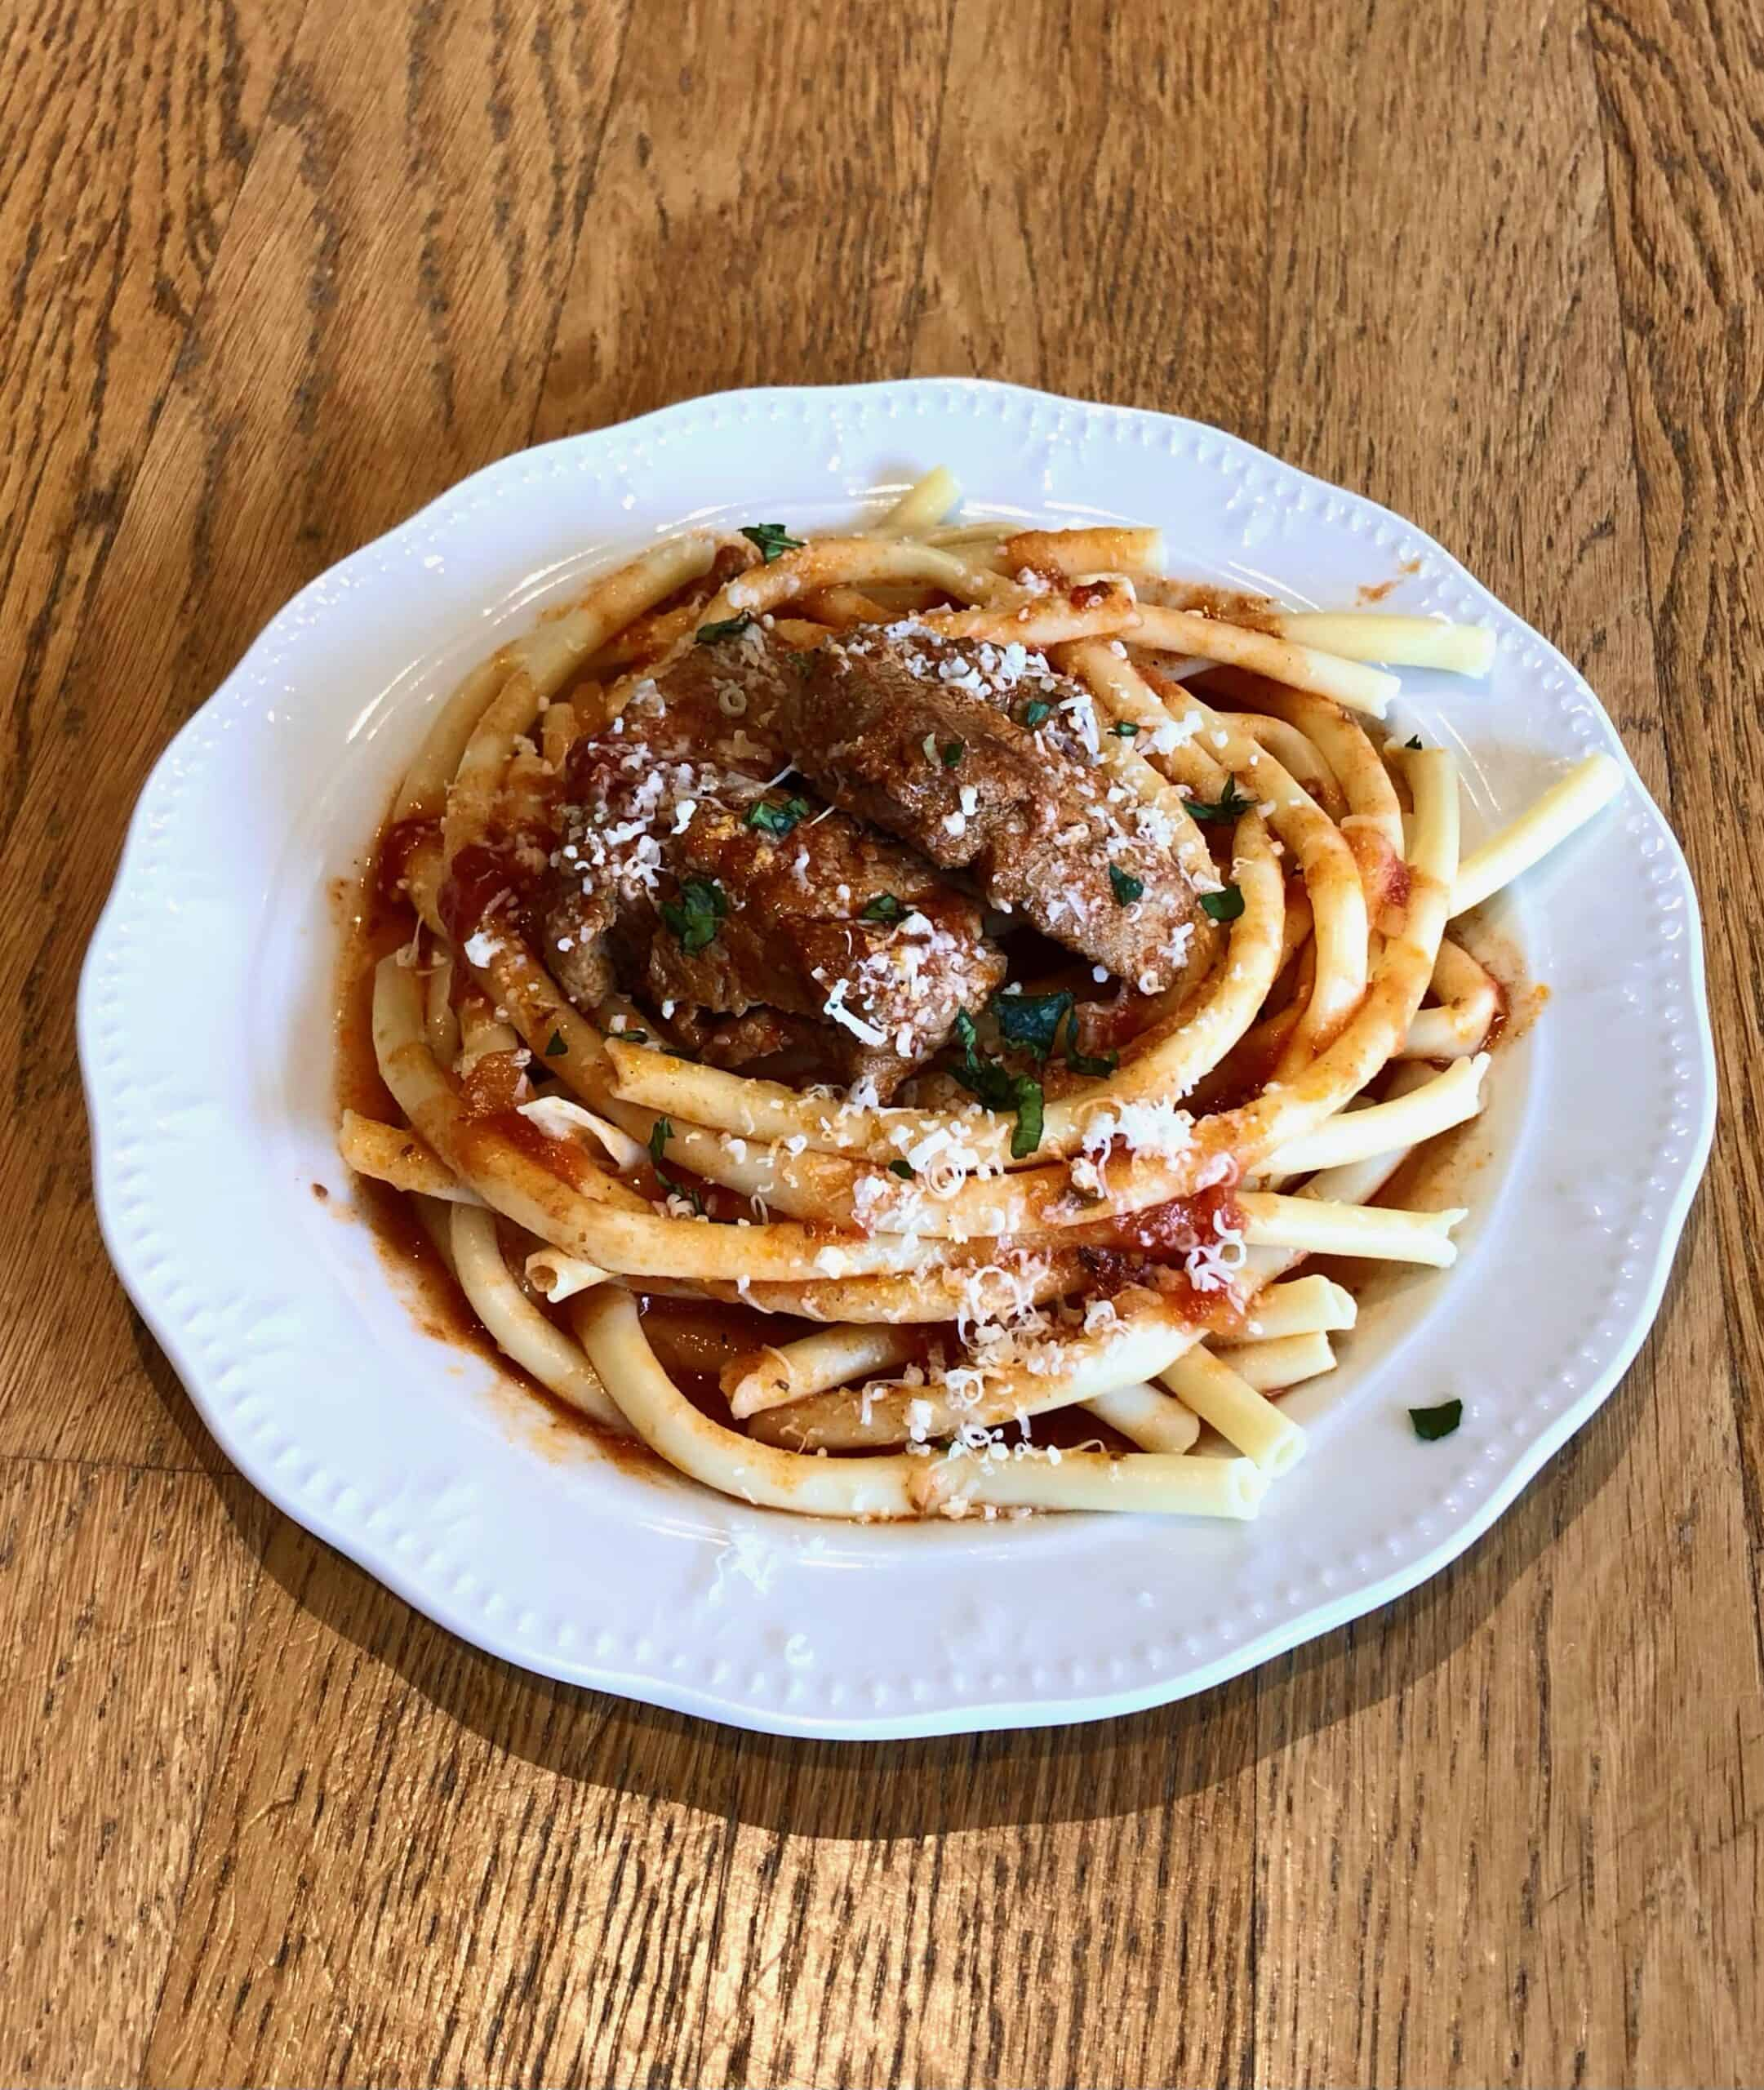 Greek Style Beef Stew in a Tomato Sauce (Mosxari Kokkinisto)